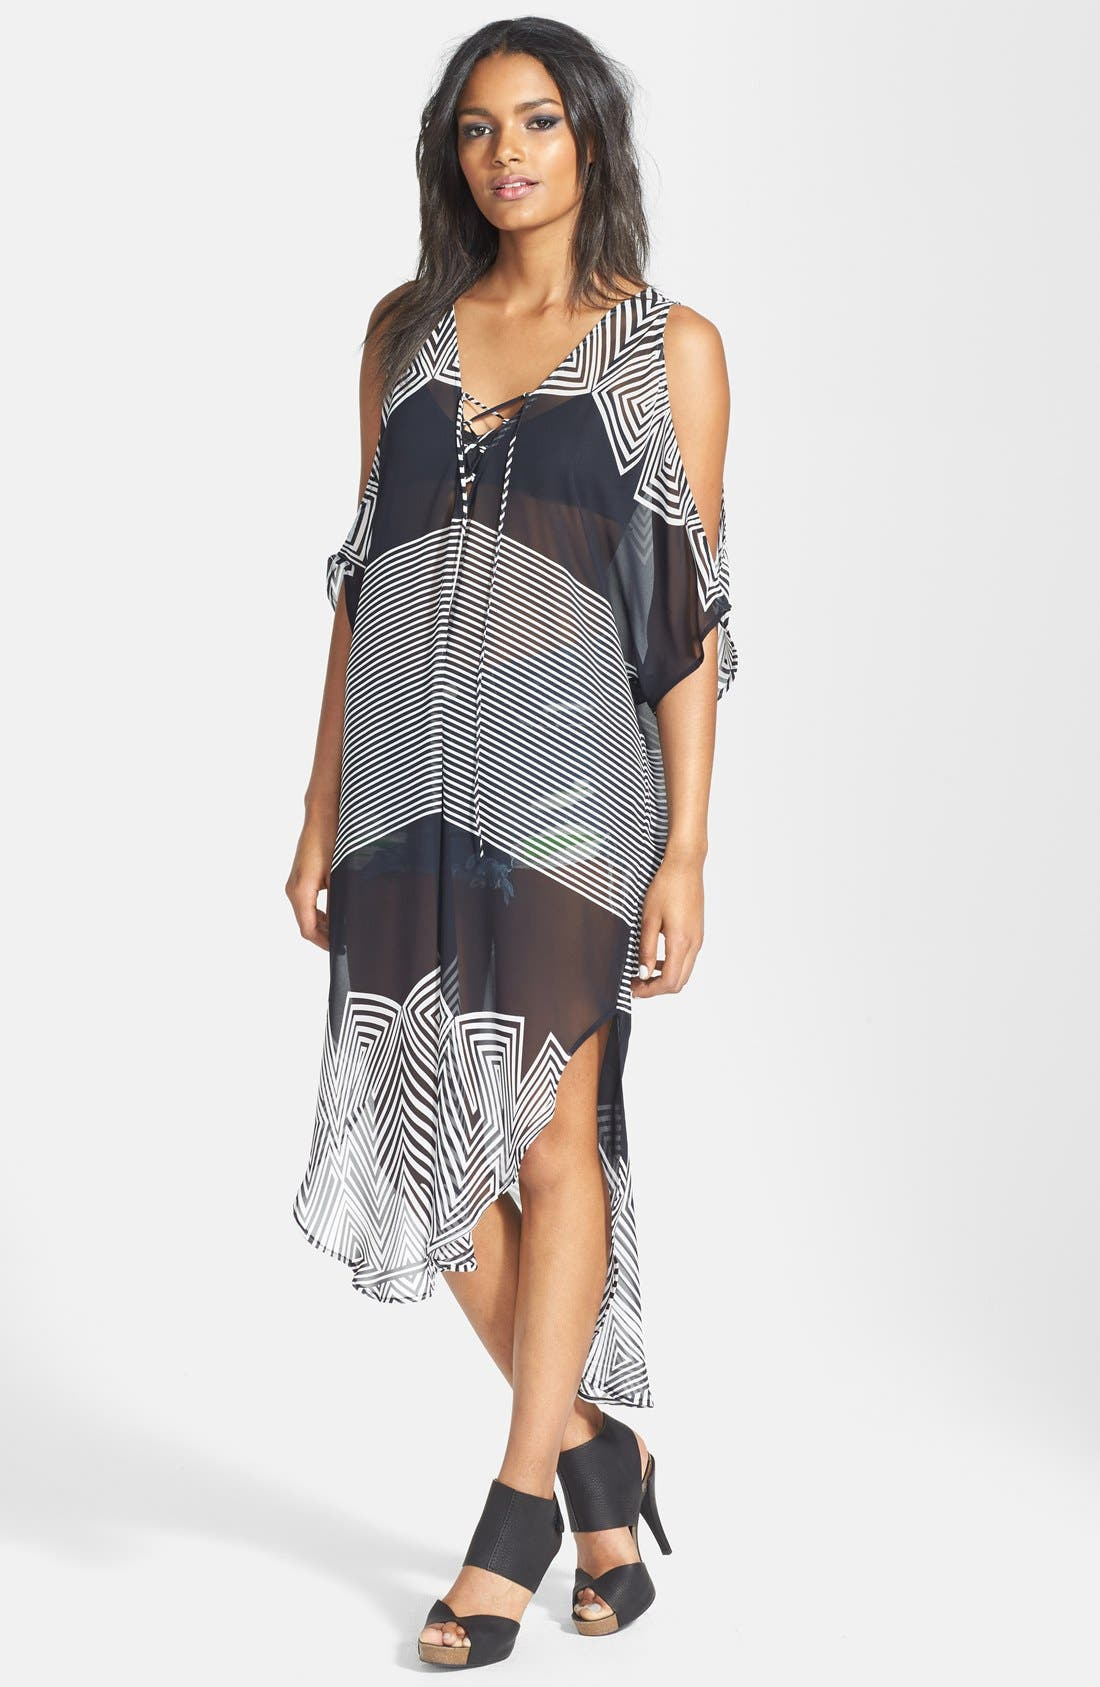 Alternate Image 1 Selected - ASTR Lace-Up Oversized Shift Dress